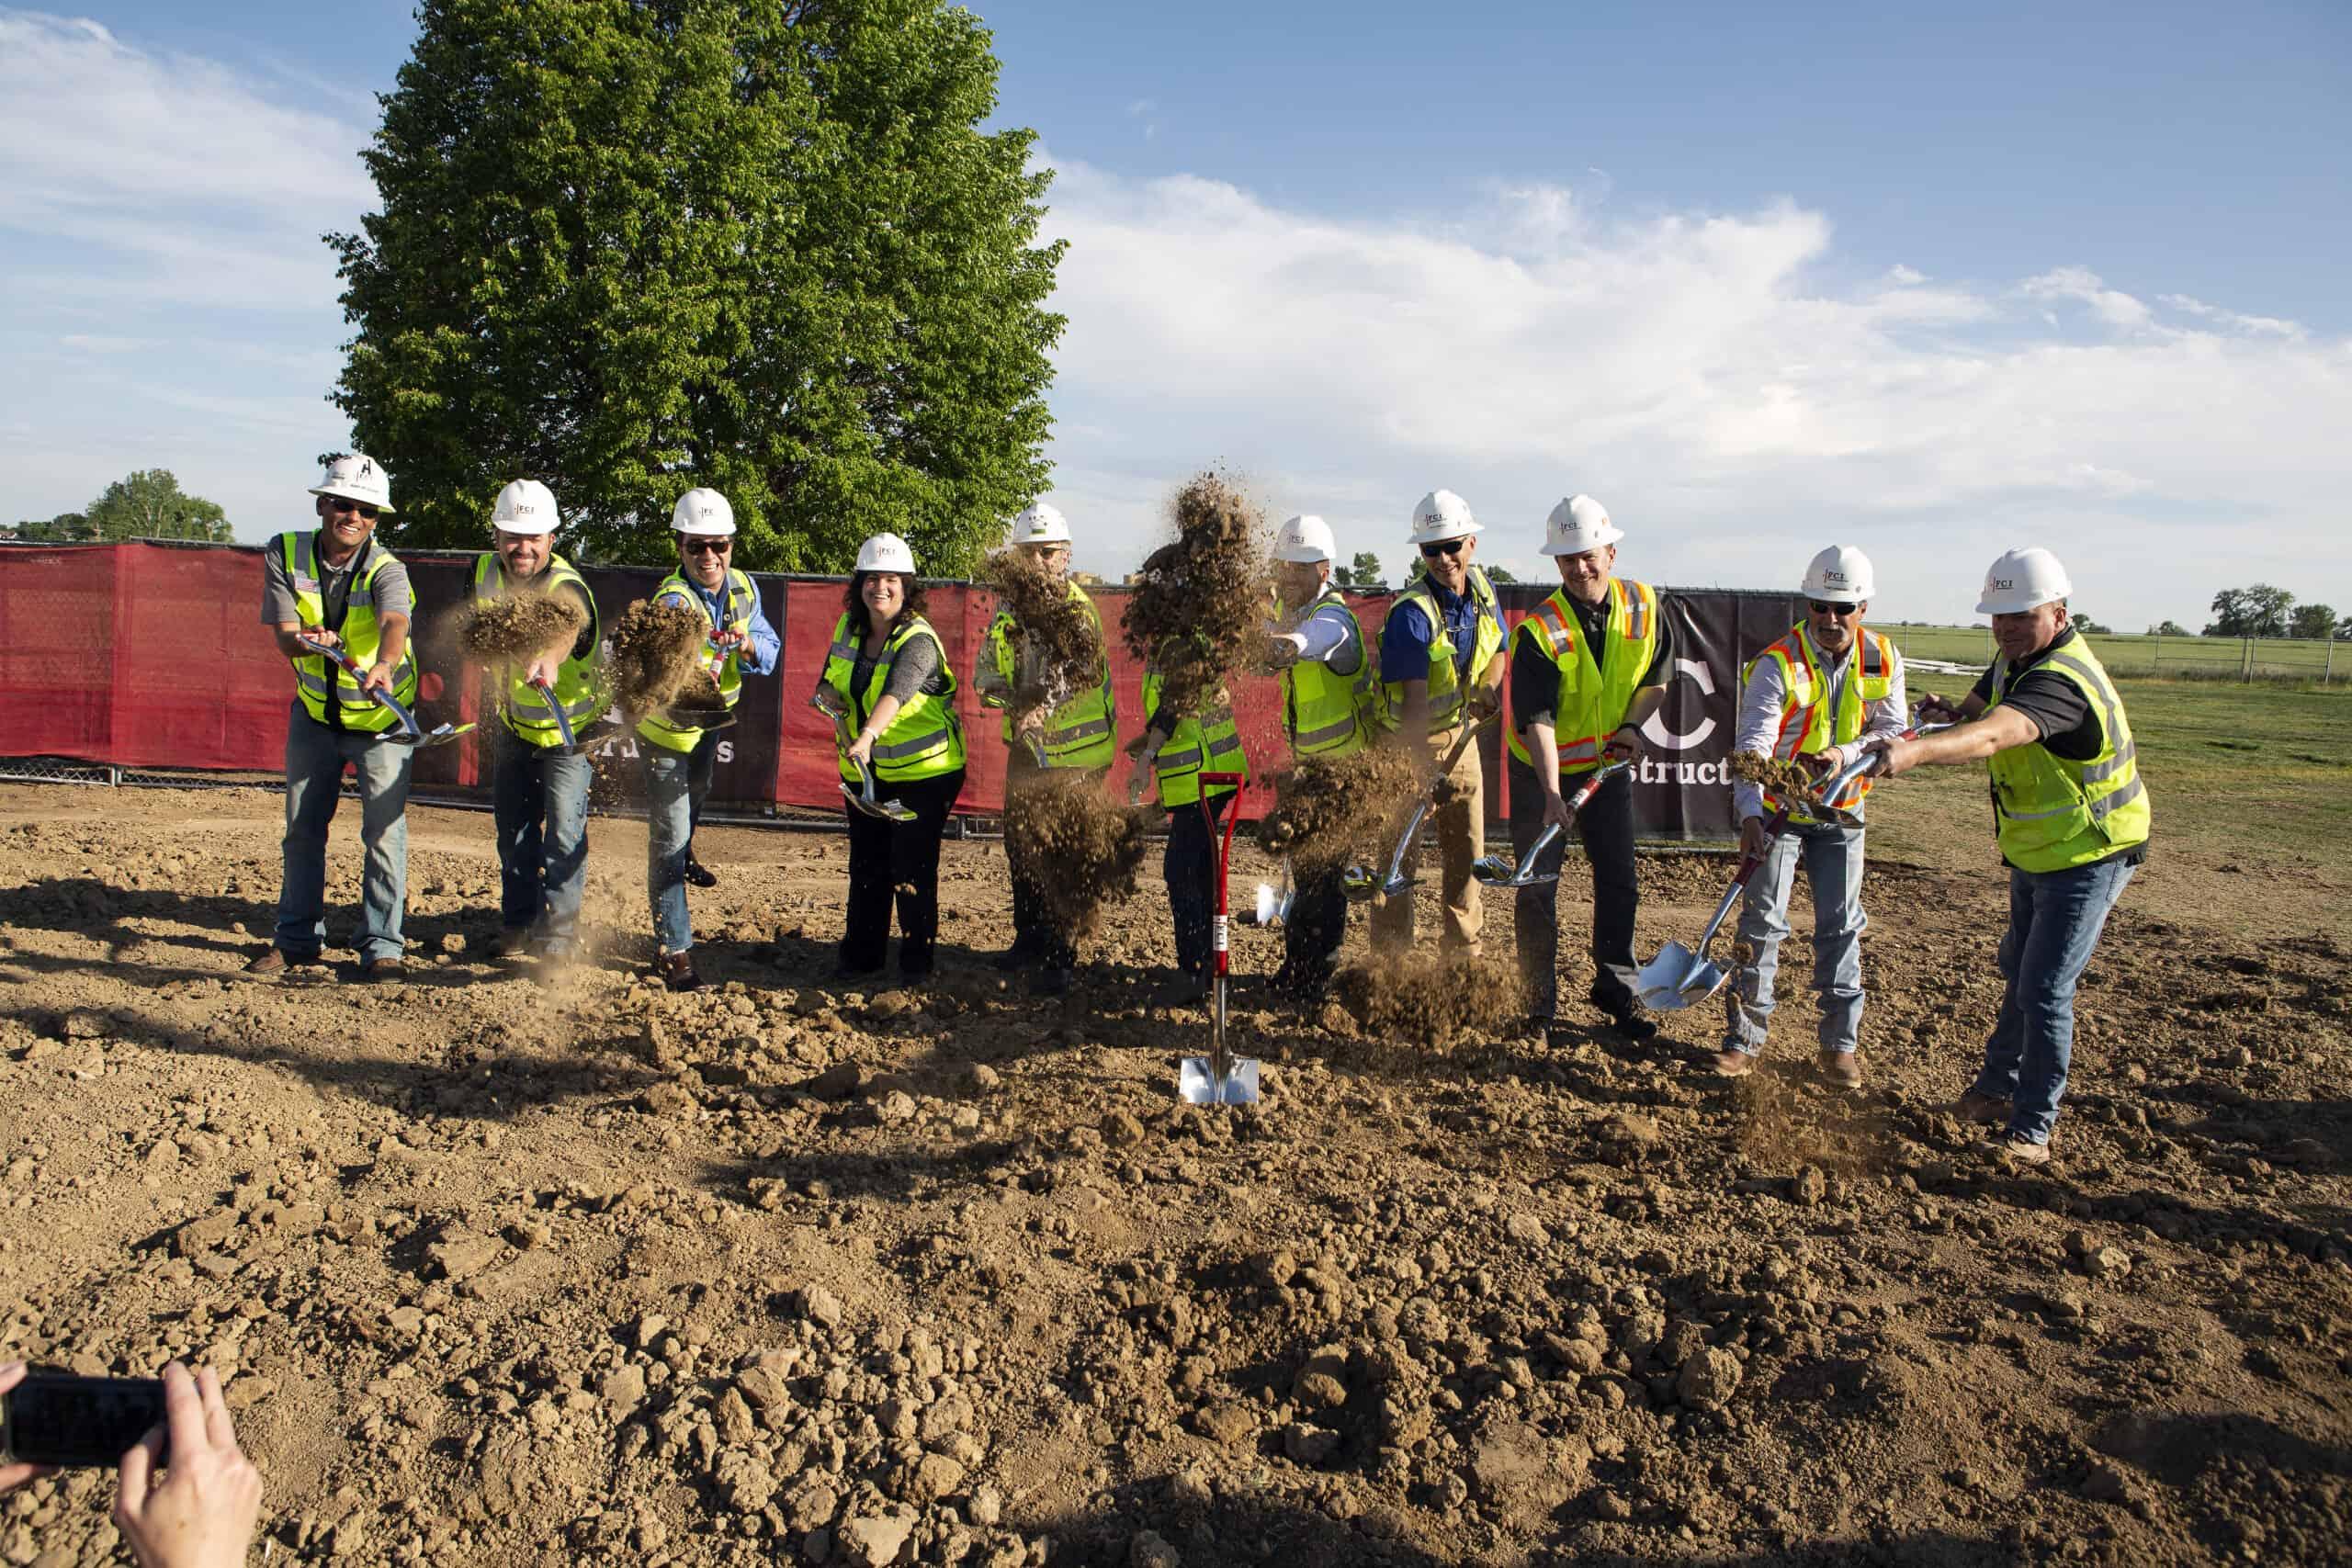 Groundbreaking ceremony of new school